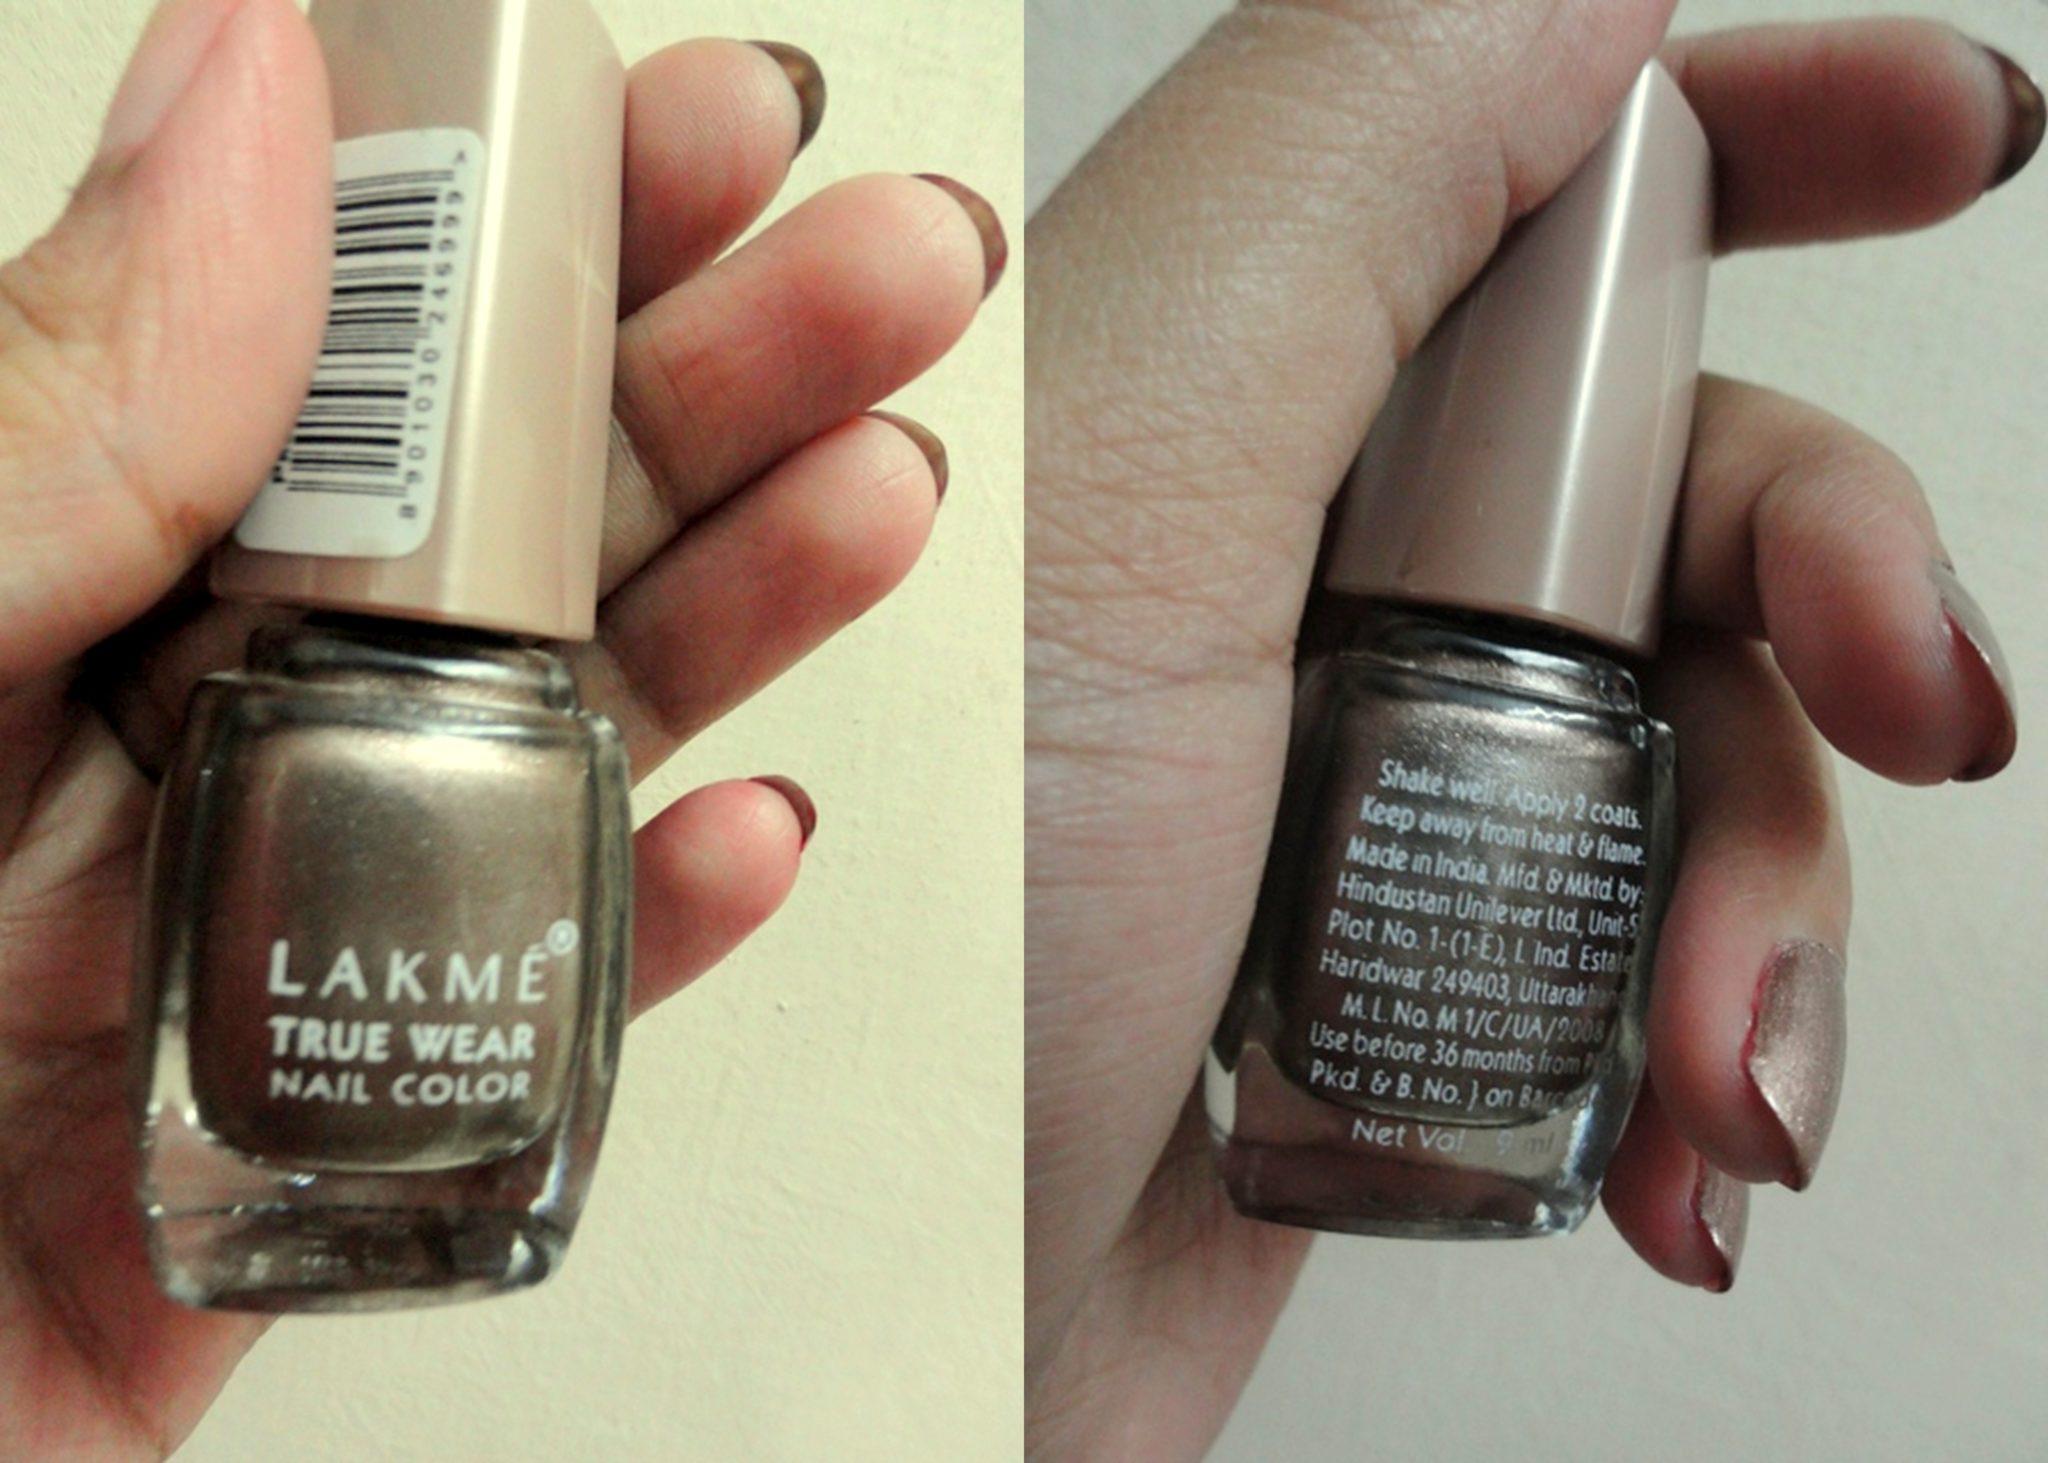 Lakme True Wear Nail Color - Manish Malhotra, Metallics, Deep Blush ...